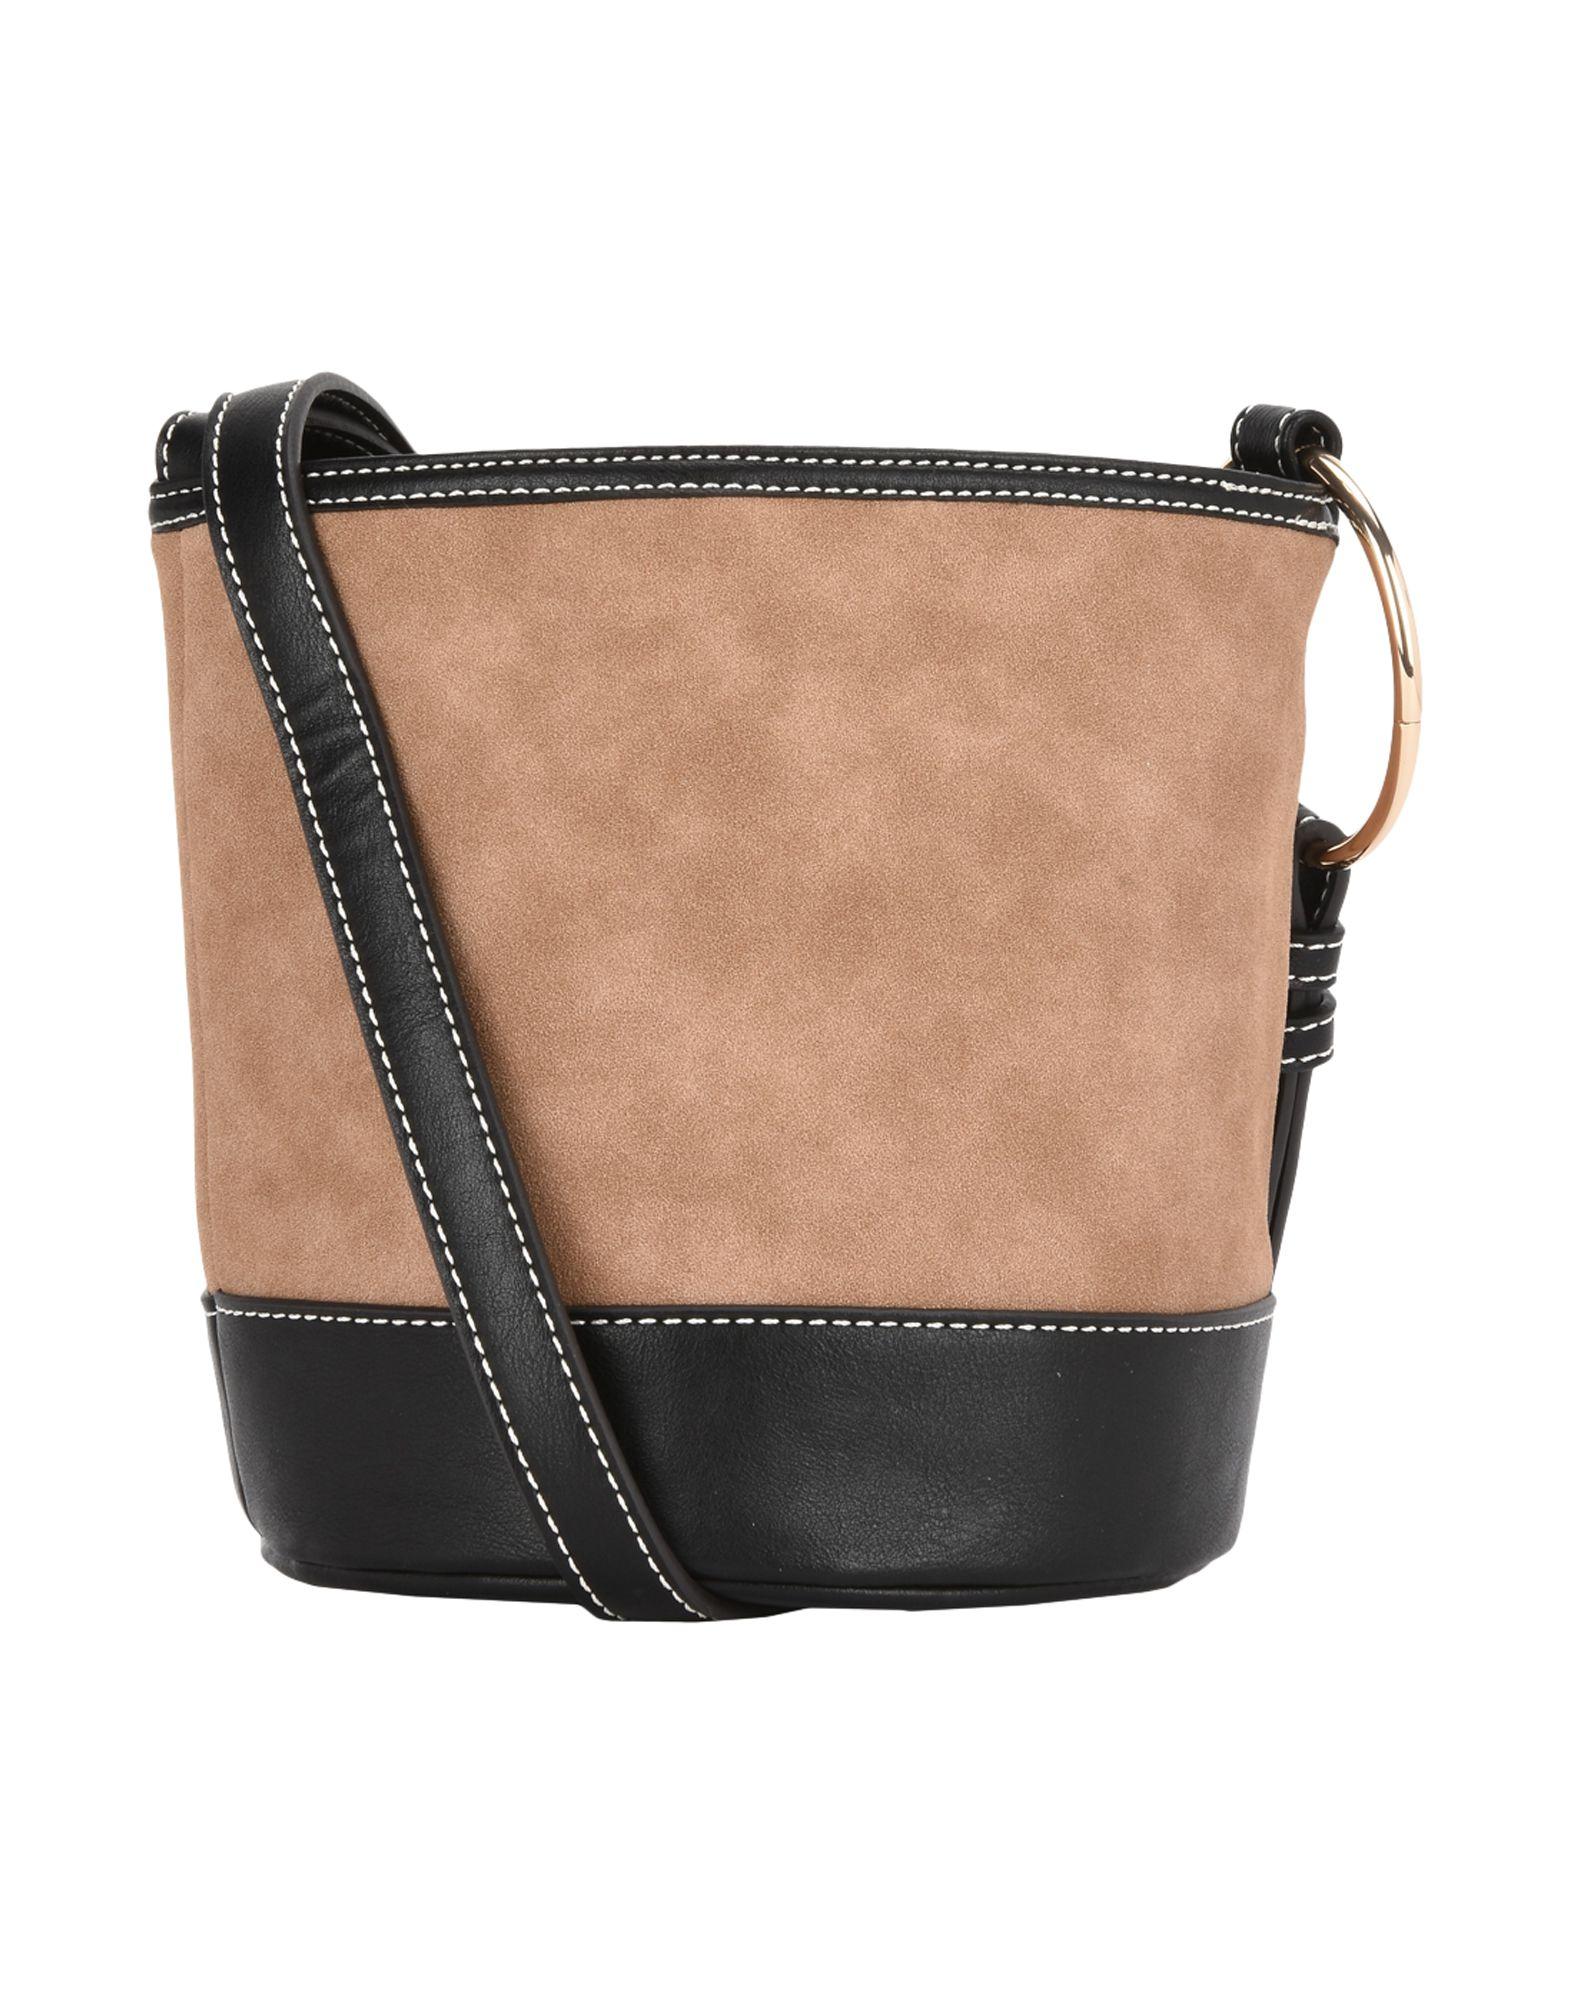 8 Сумка через плечо givenchy сумка через плечо